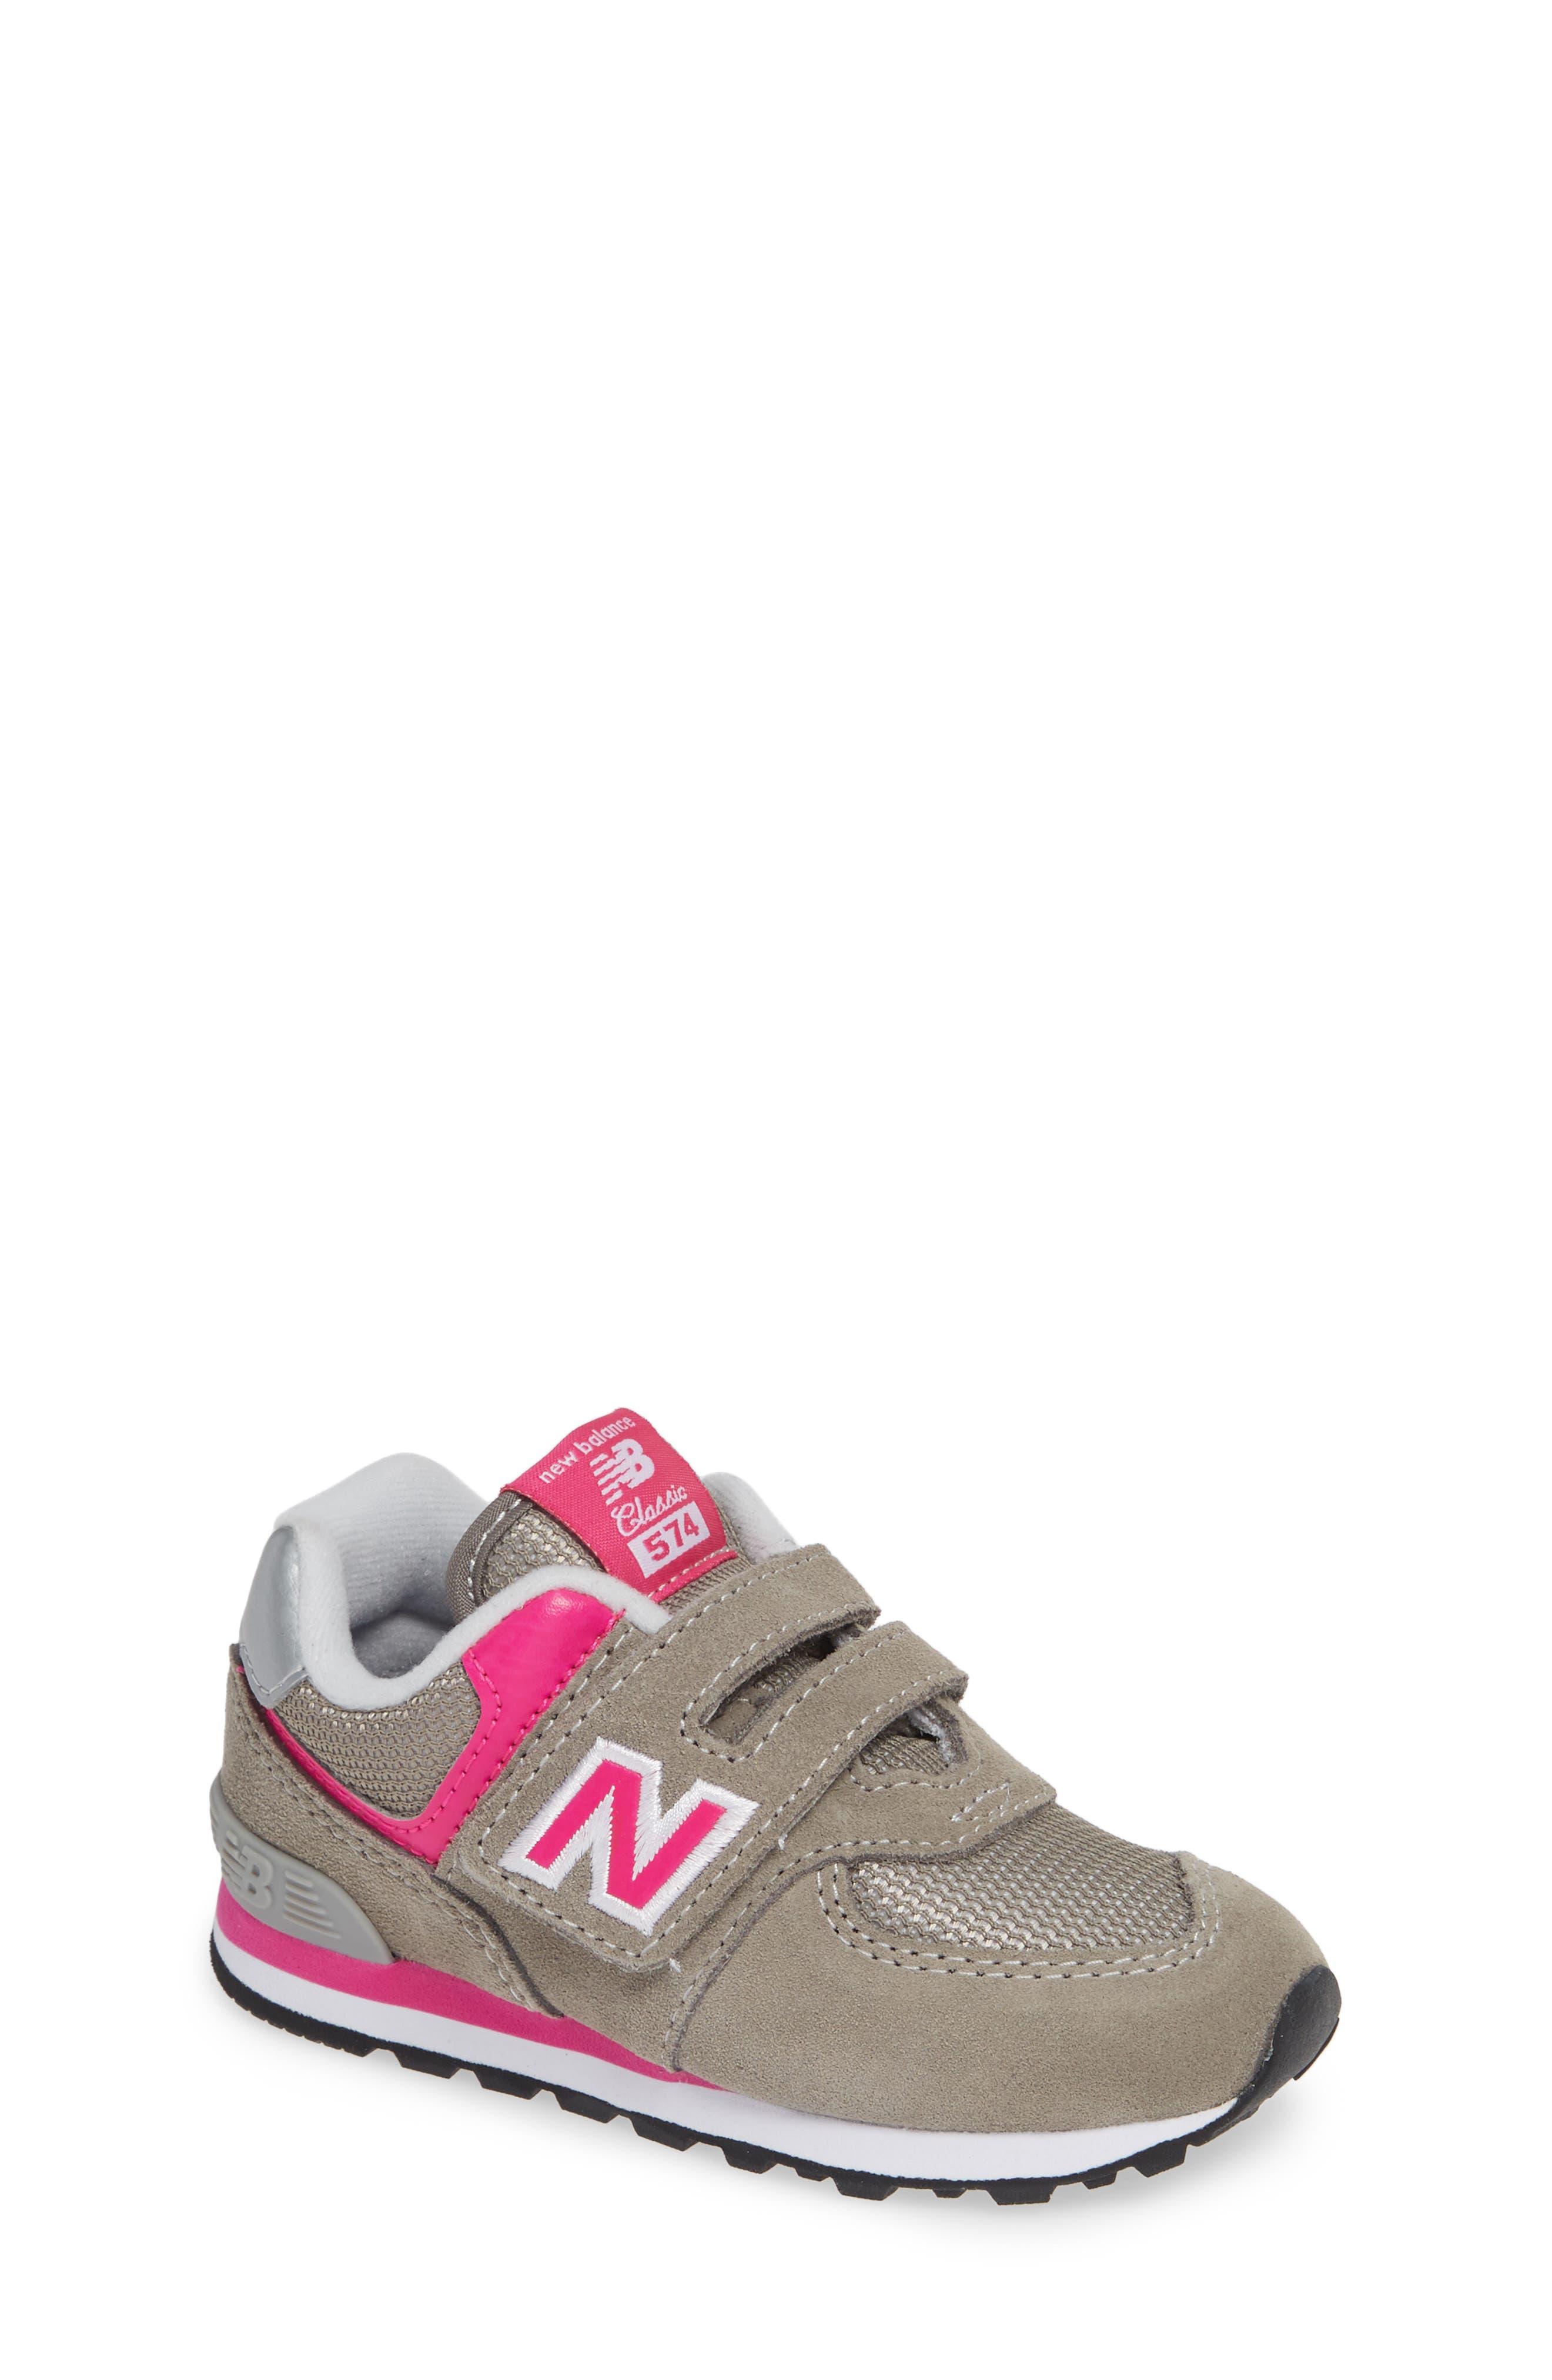 NEW BALANCE, '574 Core' Sneaker, Main thumbnail 1, color, GREY/ PINK